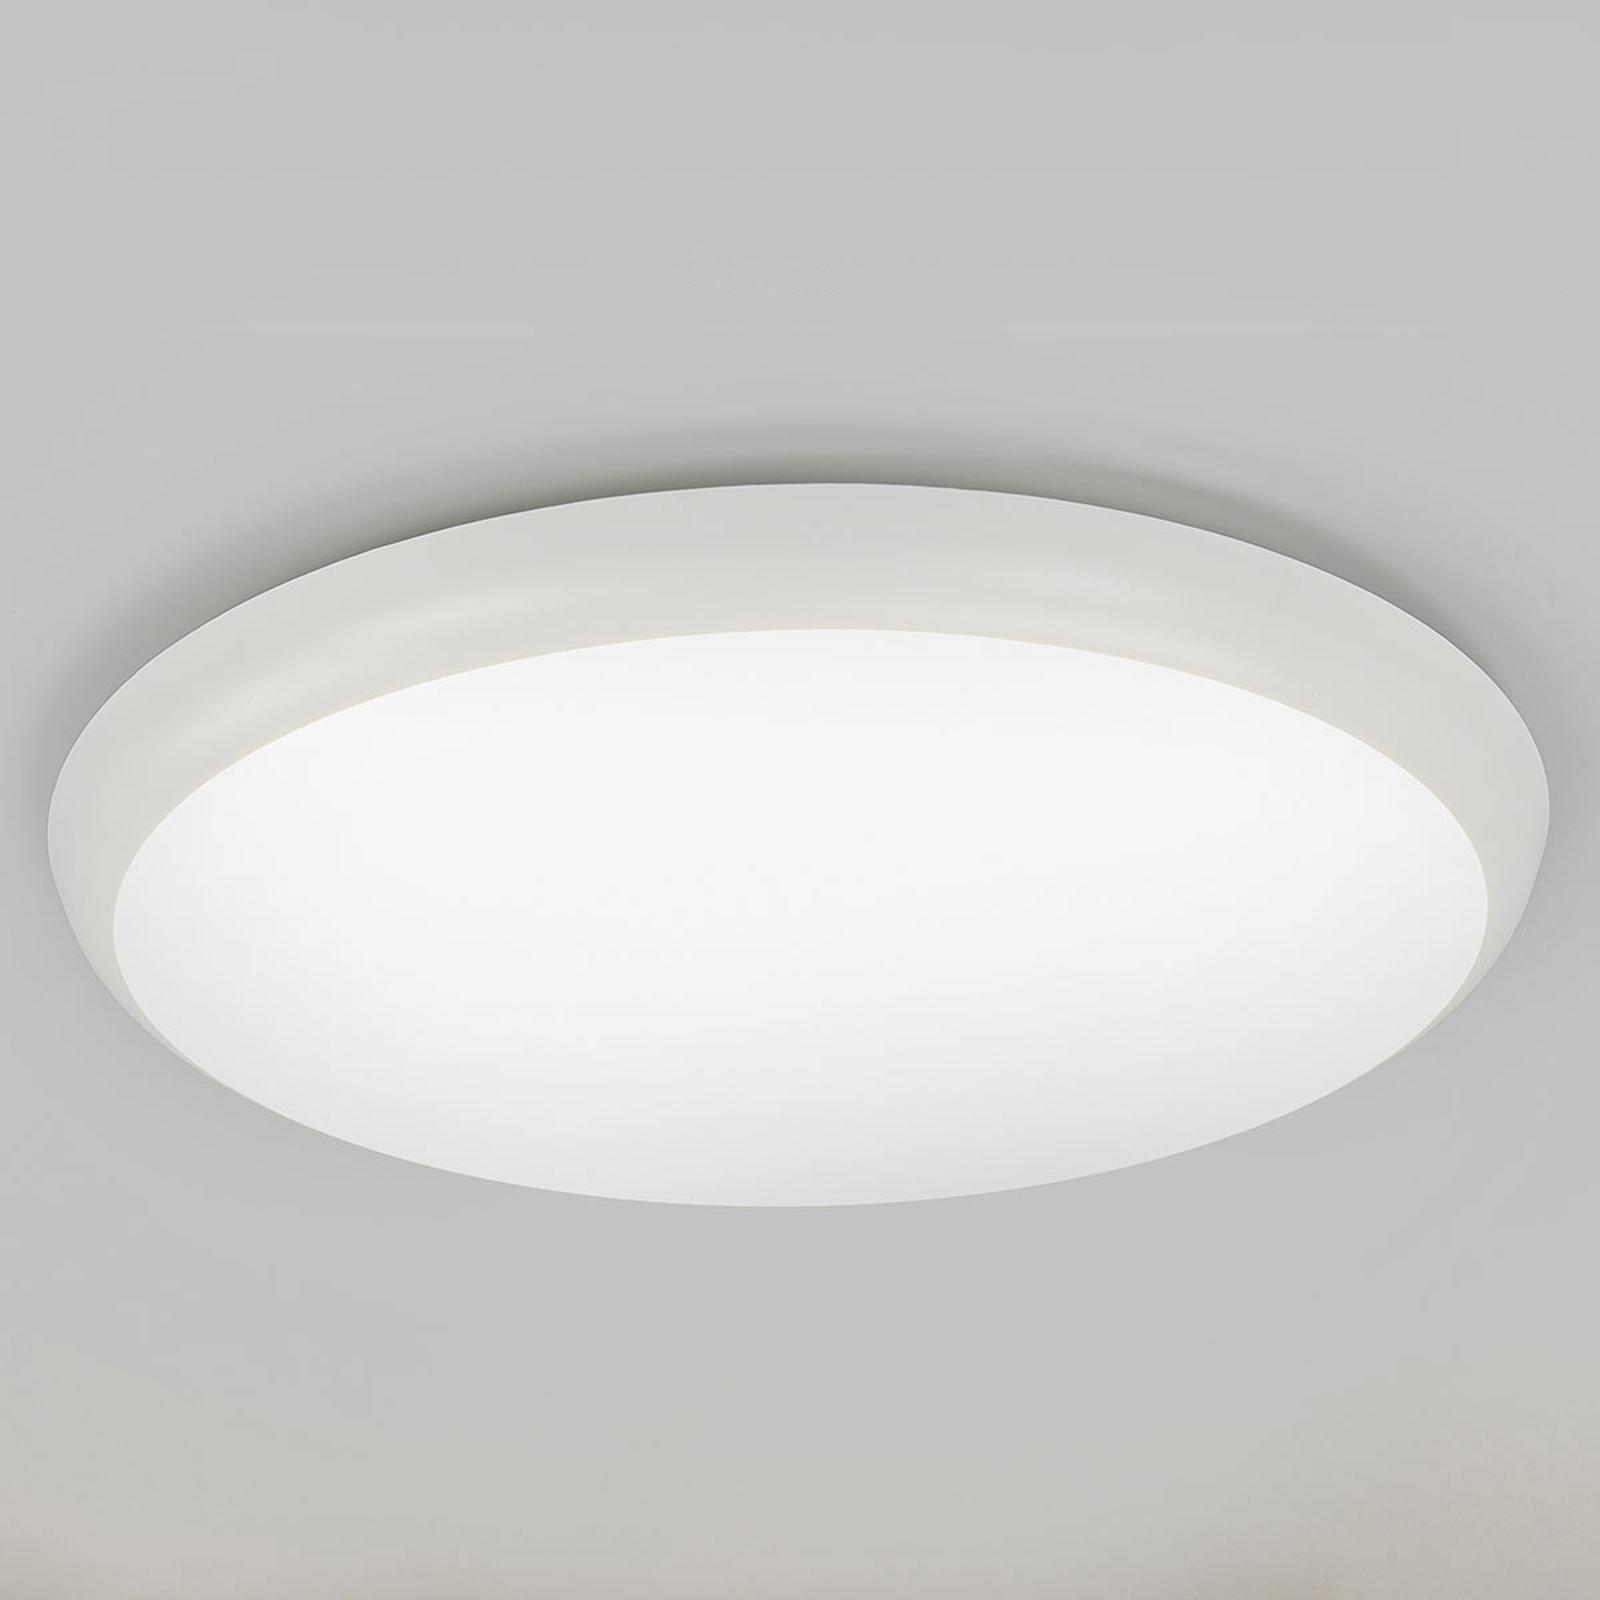 Augustin - LED-loftlampe i rund form, 40 cm